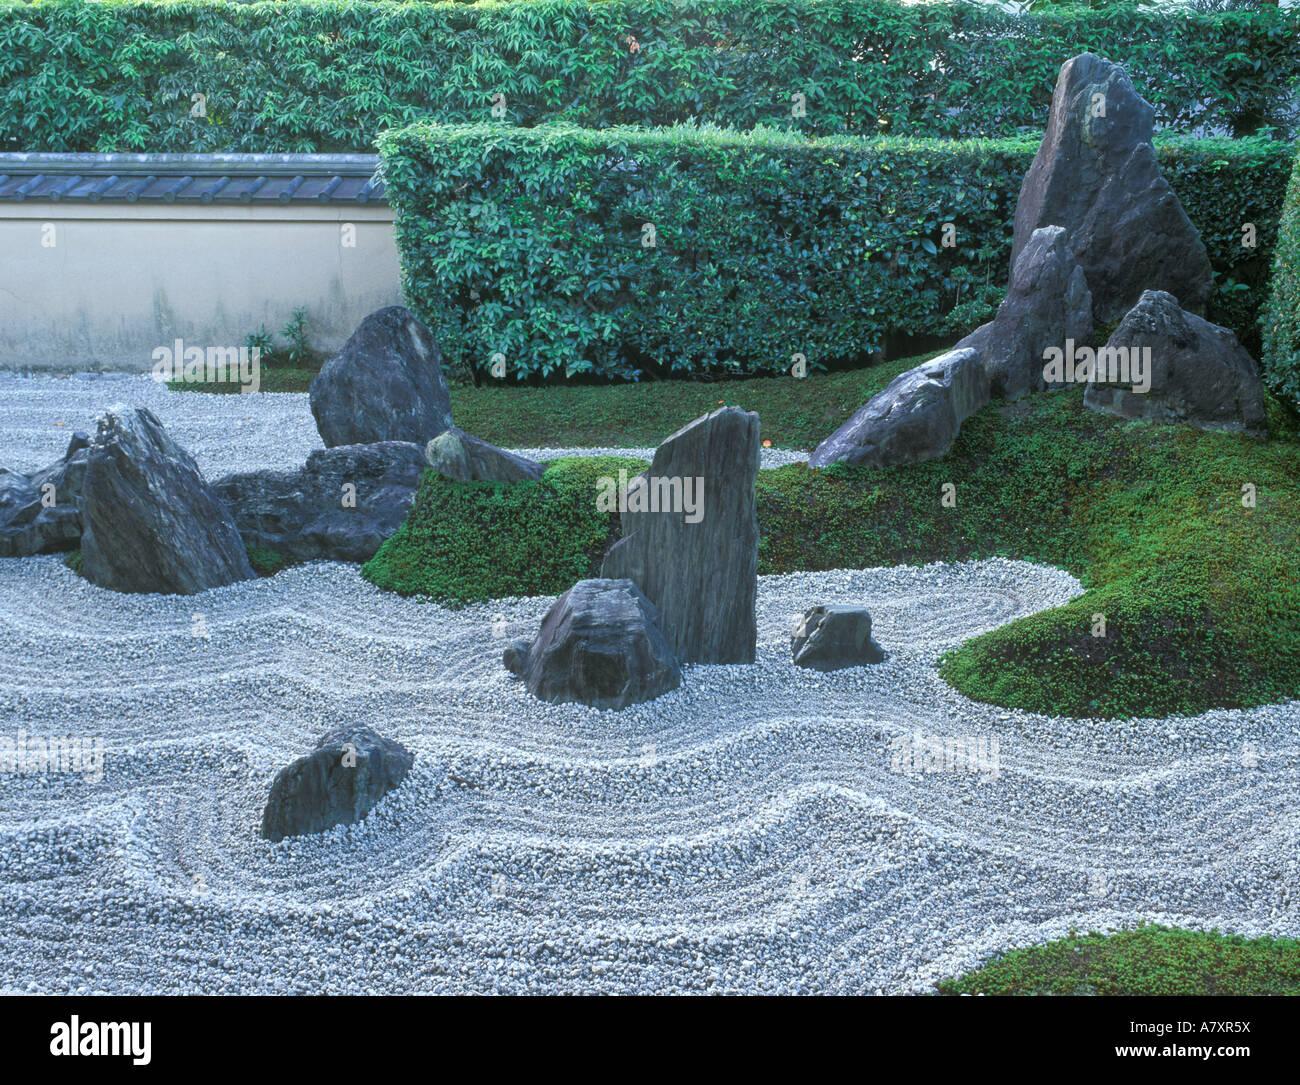 Asia, Japan, Kyoto, Daitokuji Temple, Zuiho-in Temple Rock Garden - Stock Image